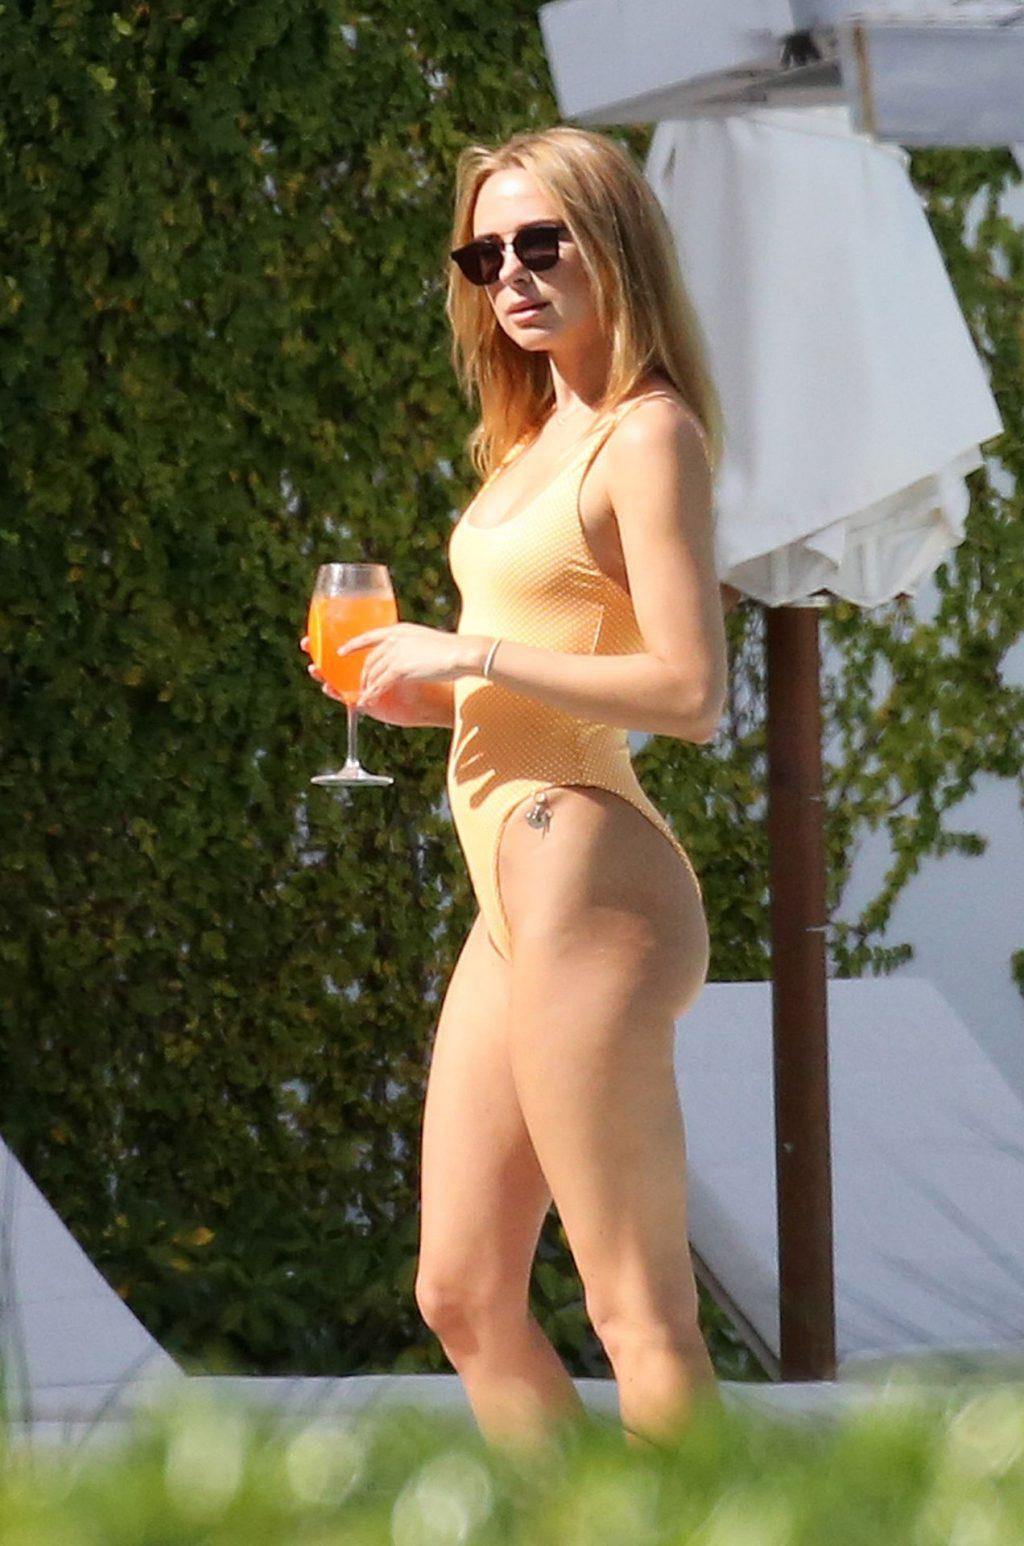 Kimberley Garner Seen Wearing an Orange Swimsuit in Miami (32 Photos)